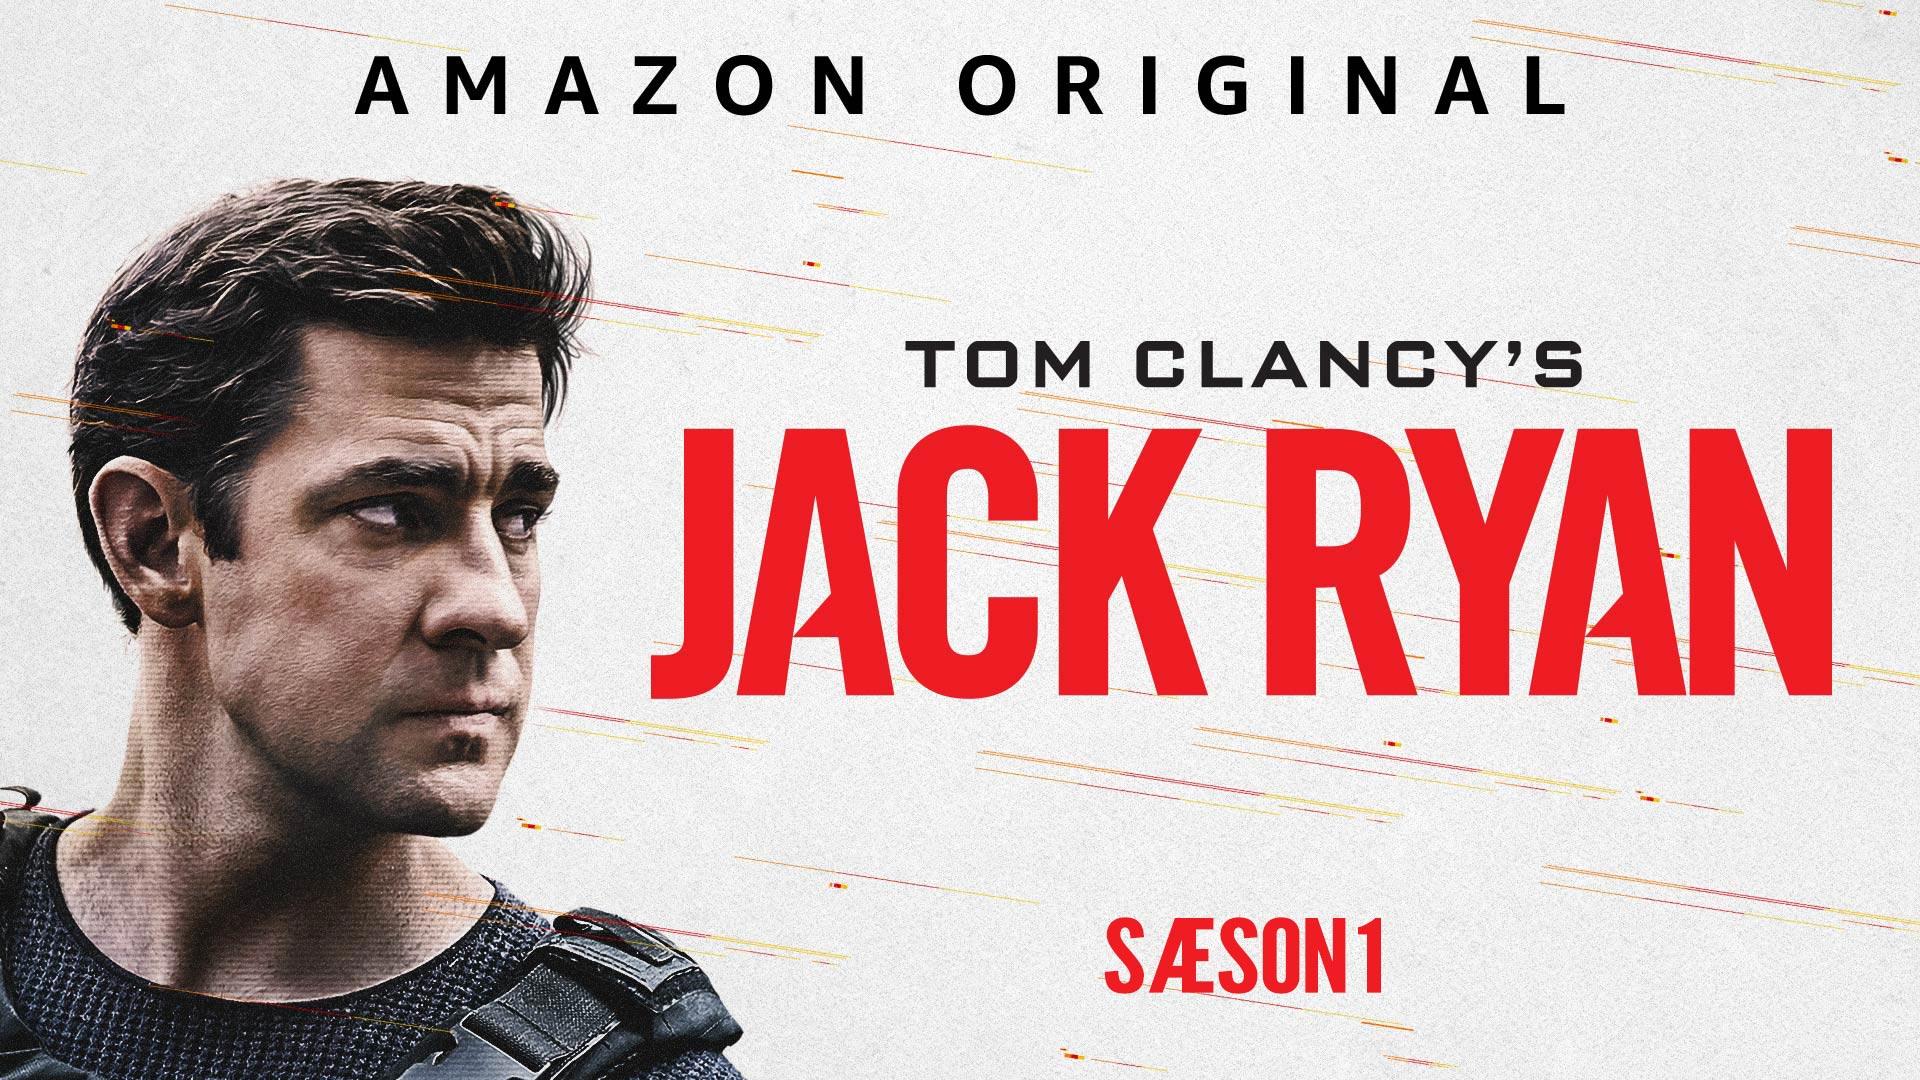 Tom Clancy's Jack Ryan - Sæson 1